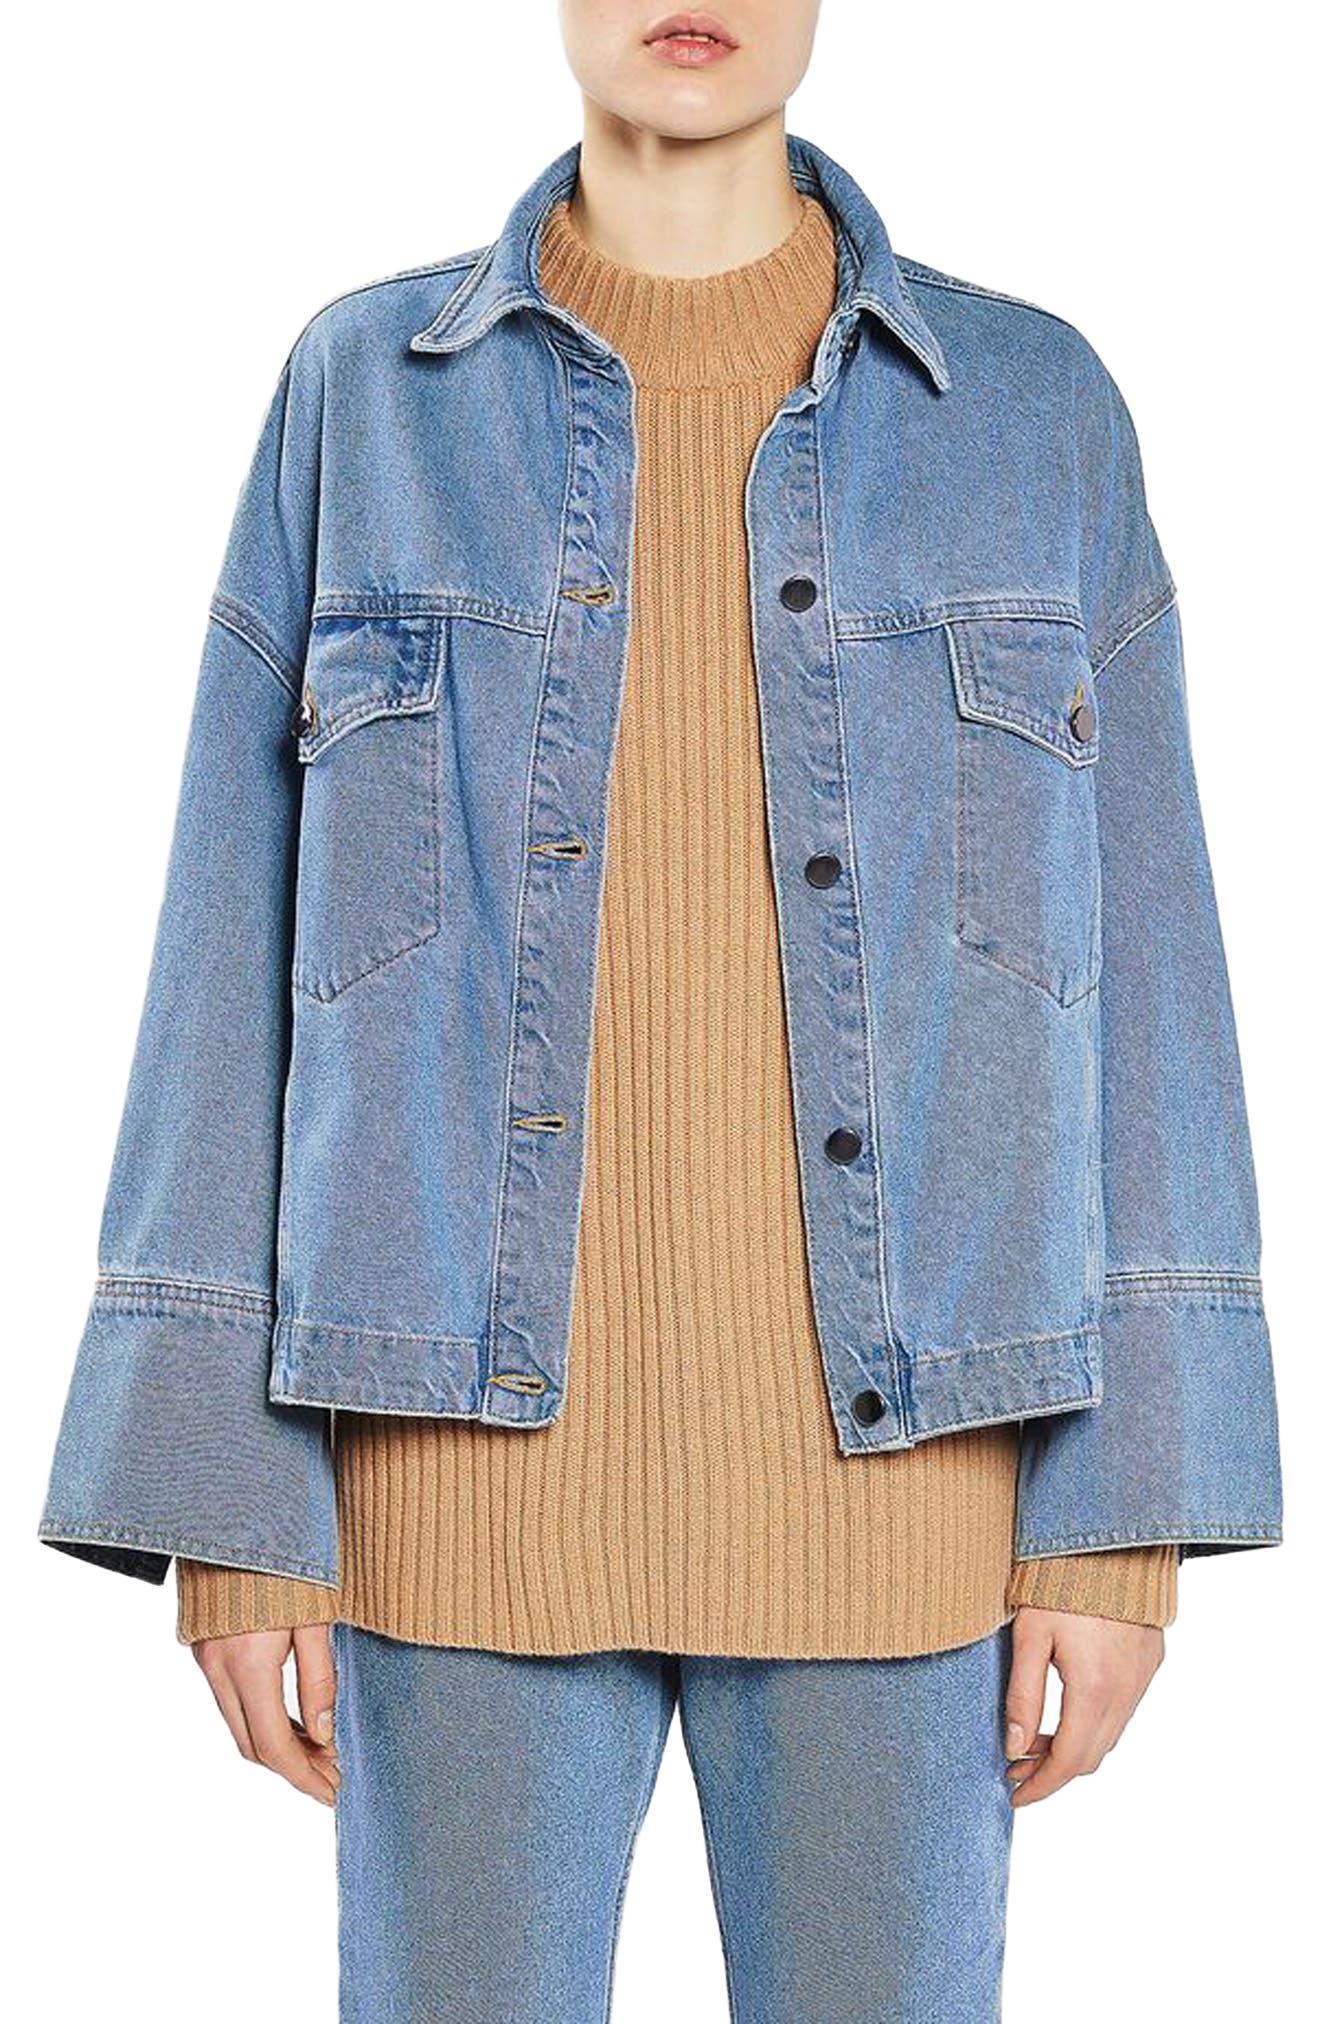 TOPSHOP BOUTIQUE Deep Cuff Denim Jacket